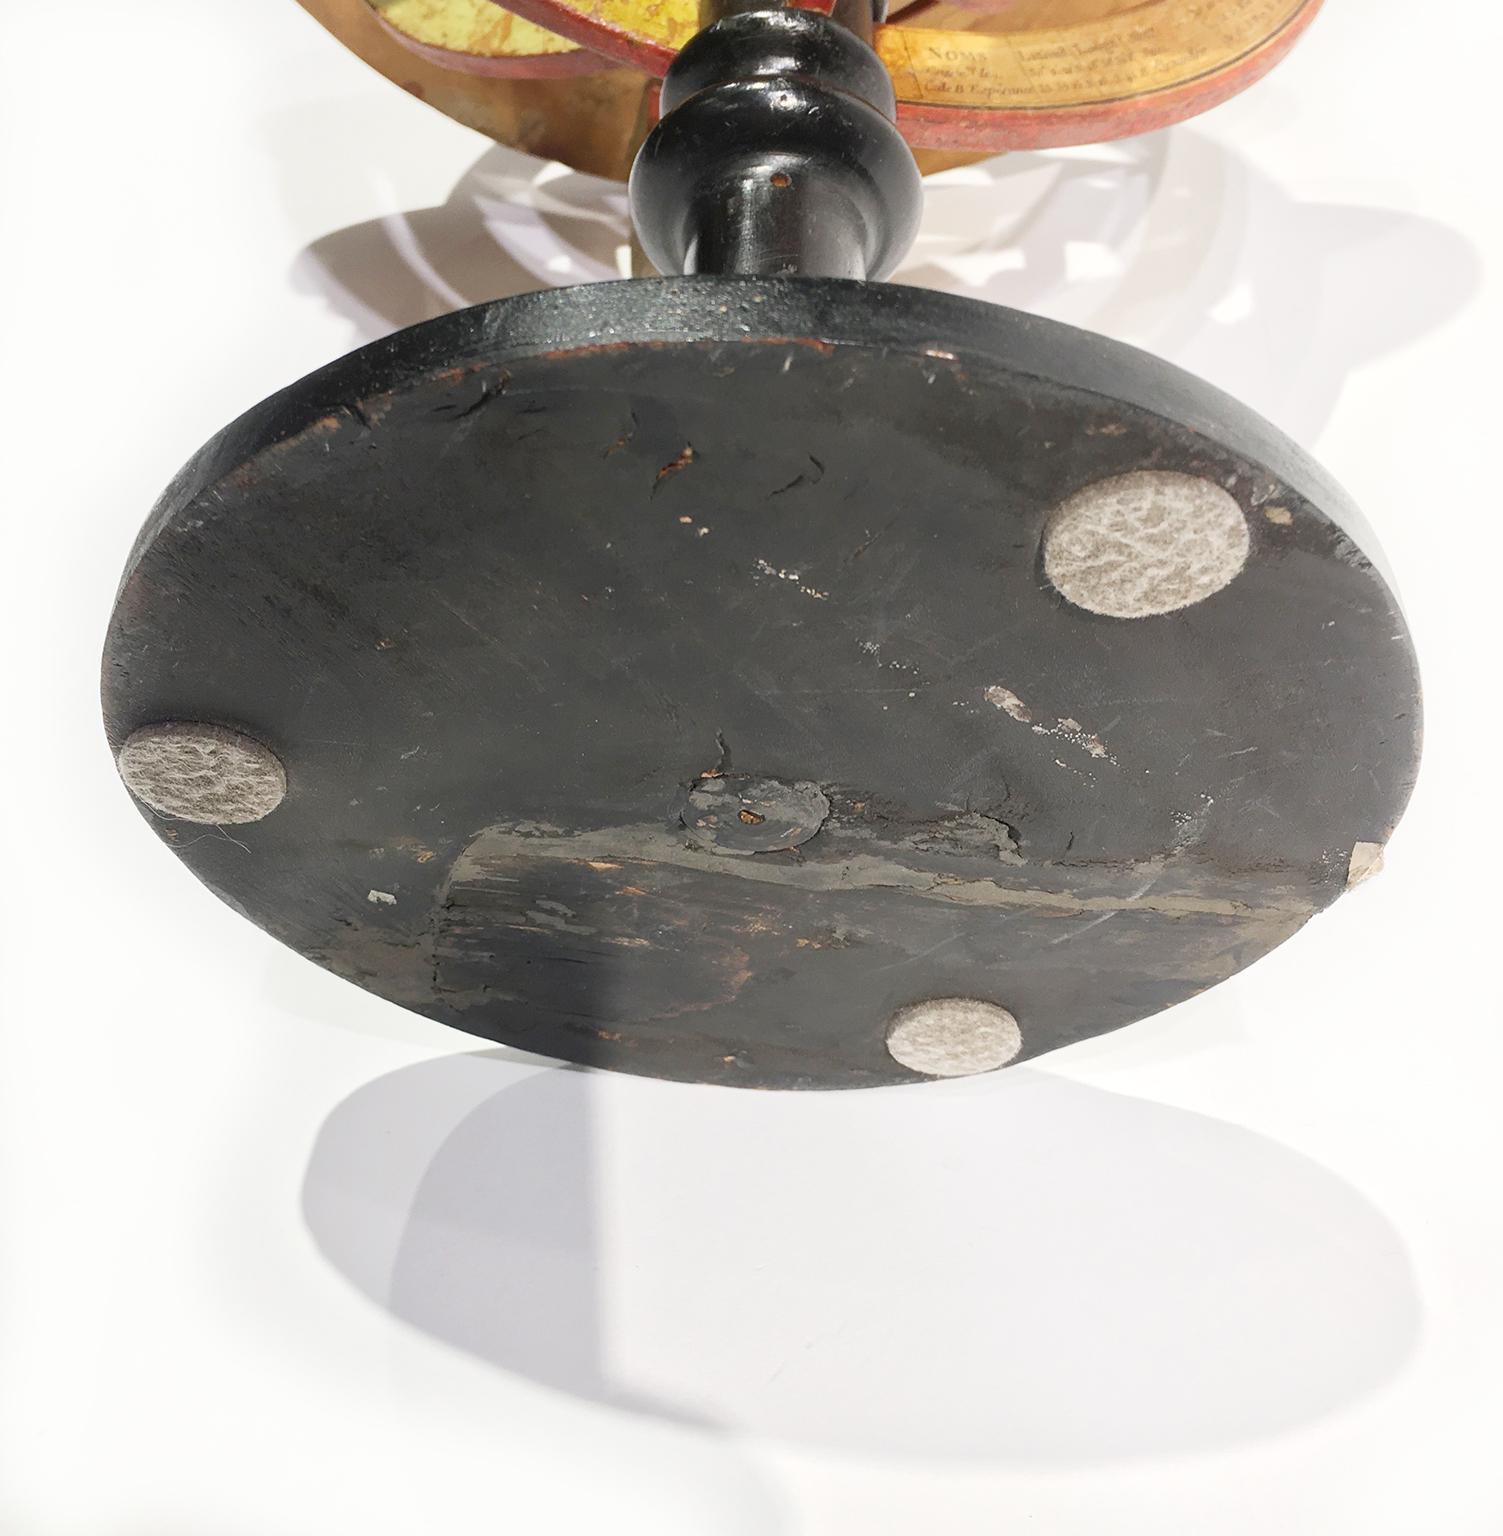 thumb4|Charles-François Delamarche, Sfera armillare tolemaica. Parigi, 1805-1810 circa